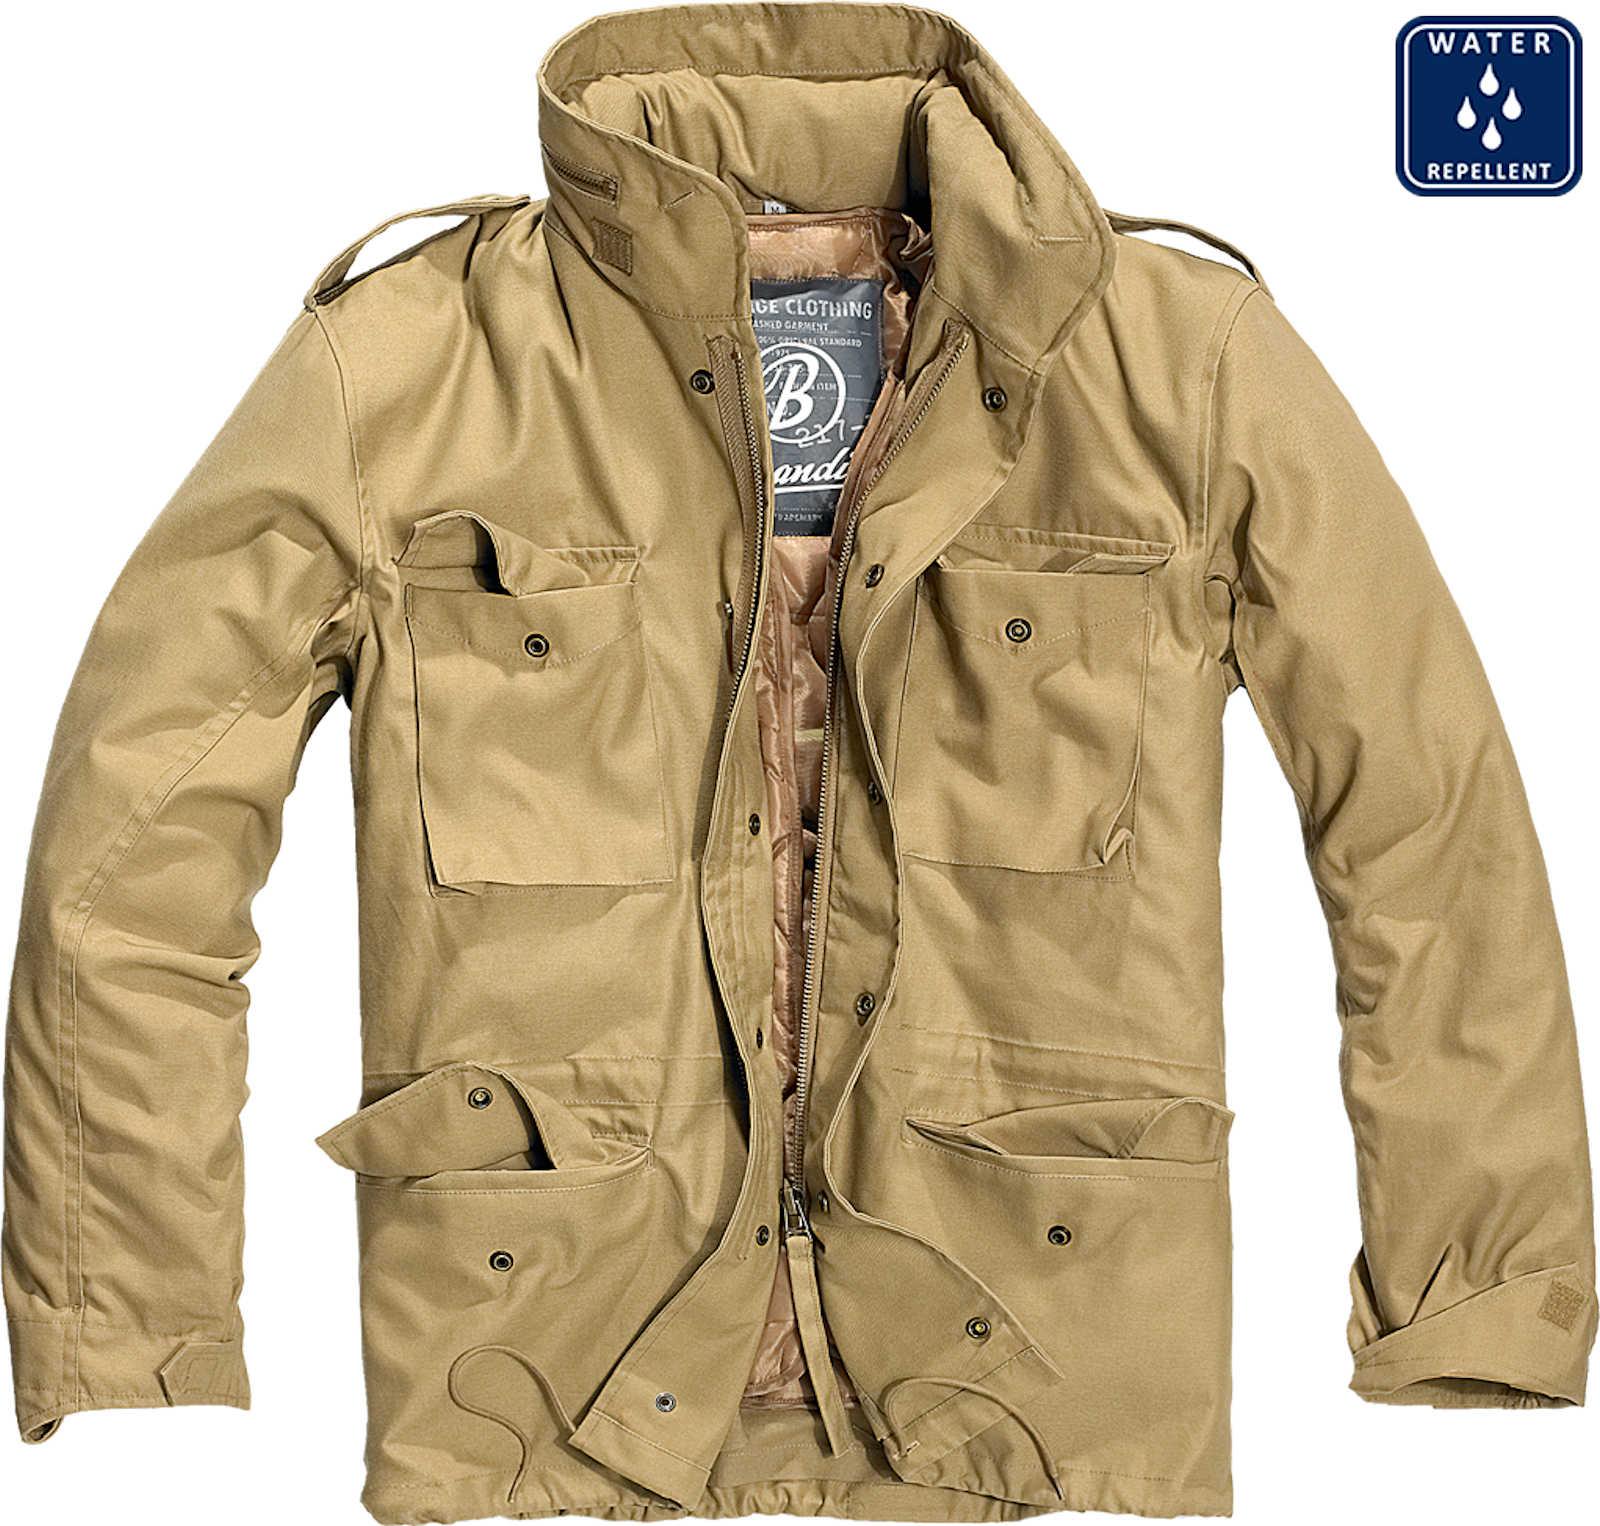 Details zu Brandit Herren M65 Standard 3108 Classic Feldjacke Outdoor Parka US Futter